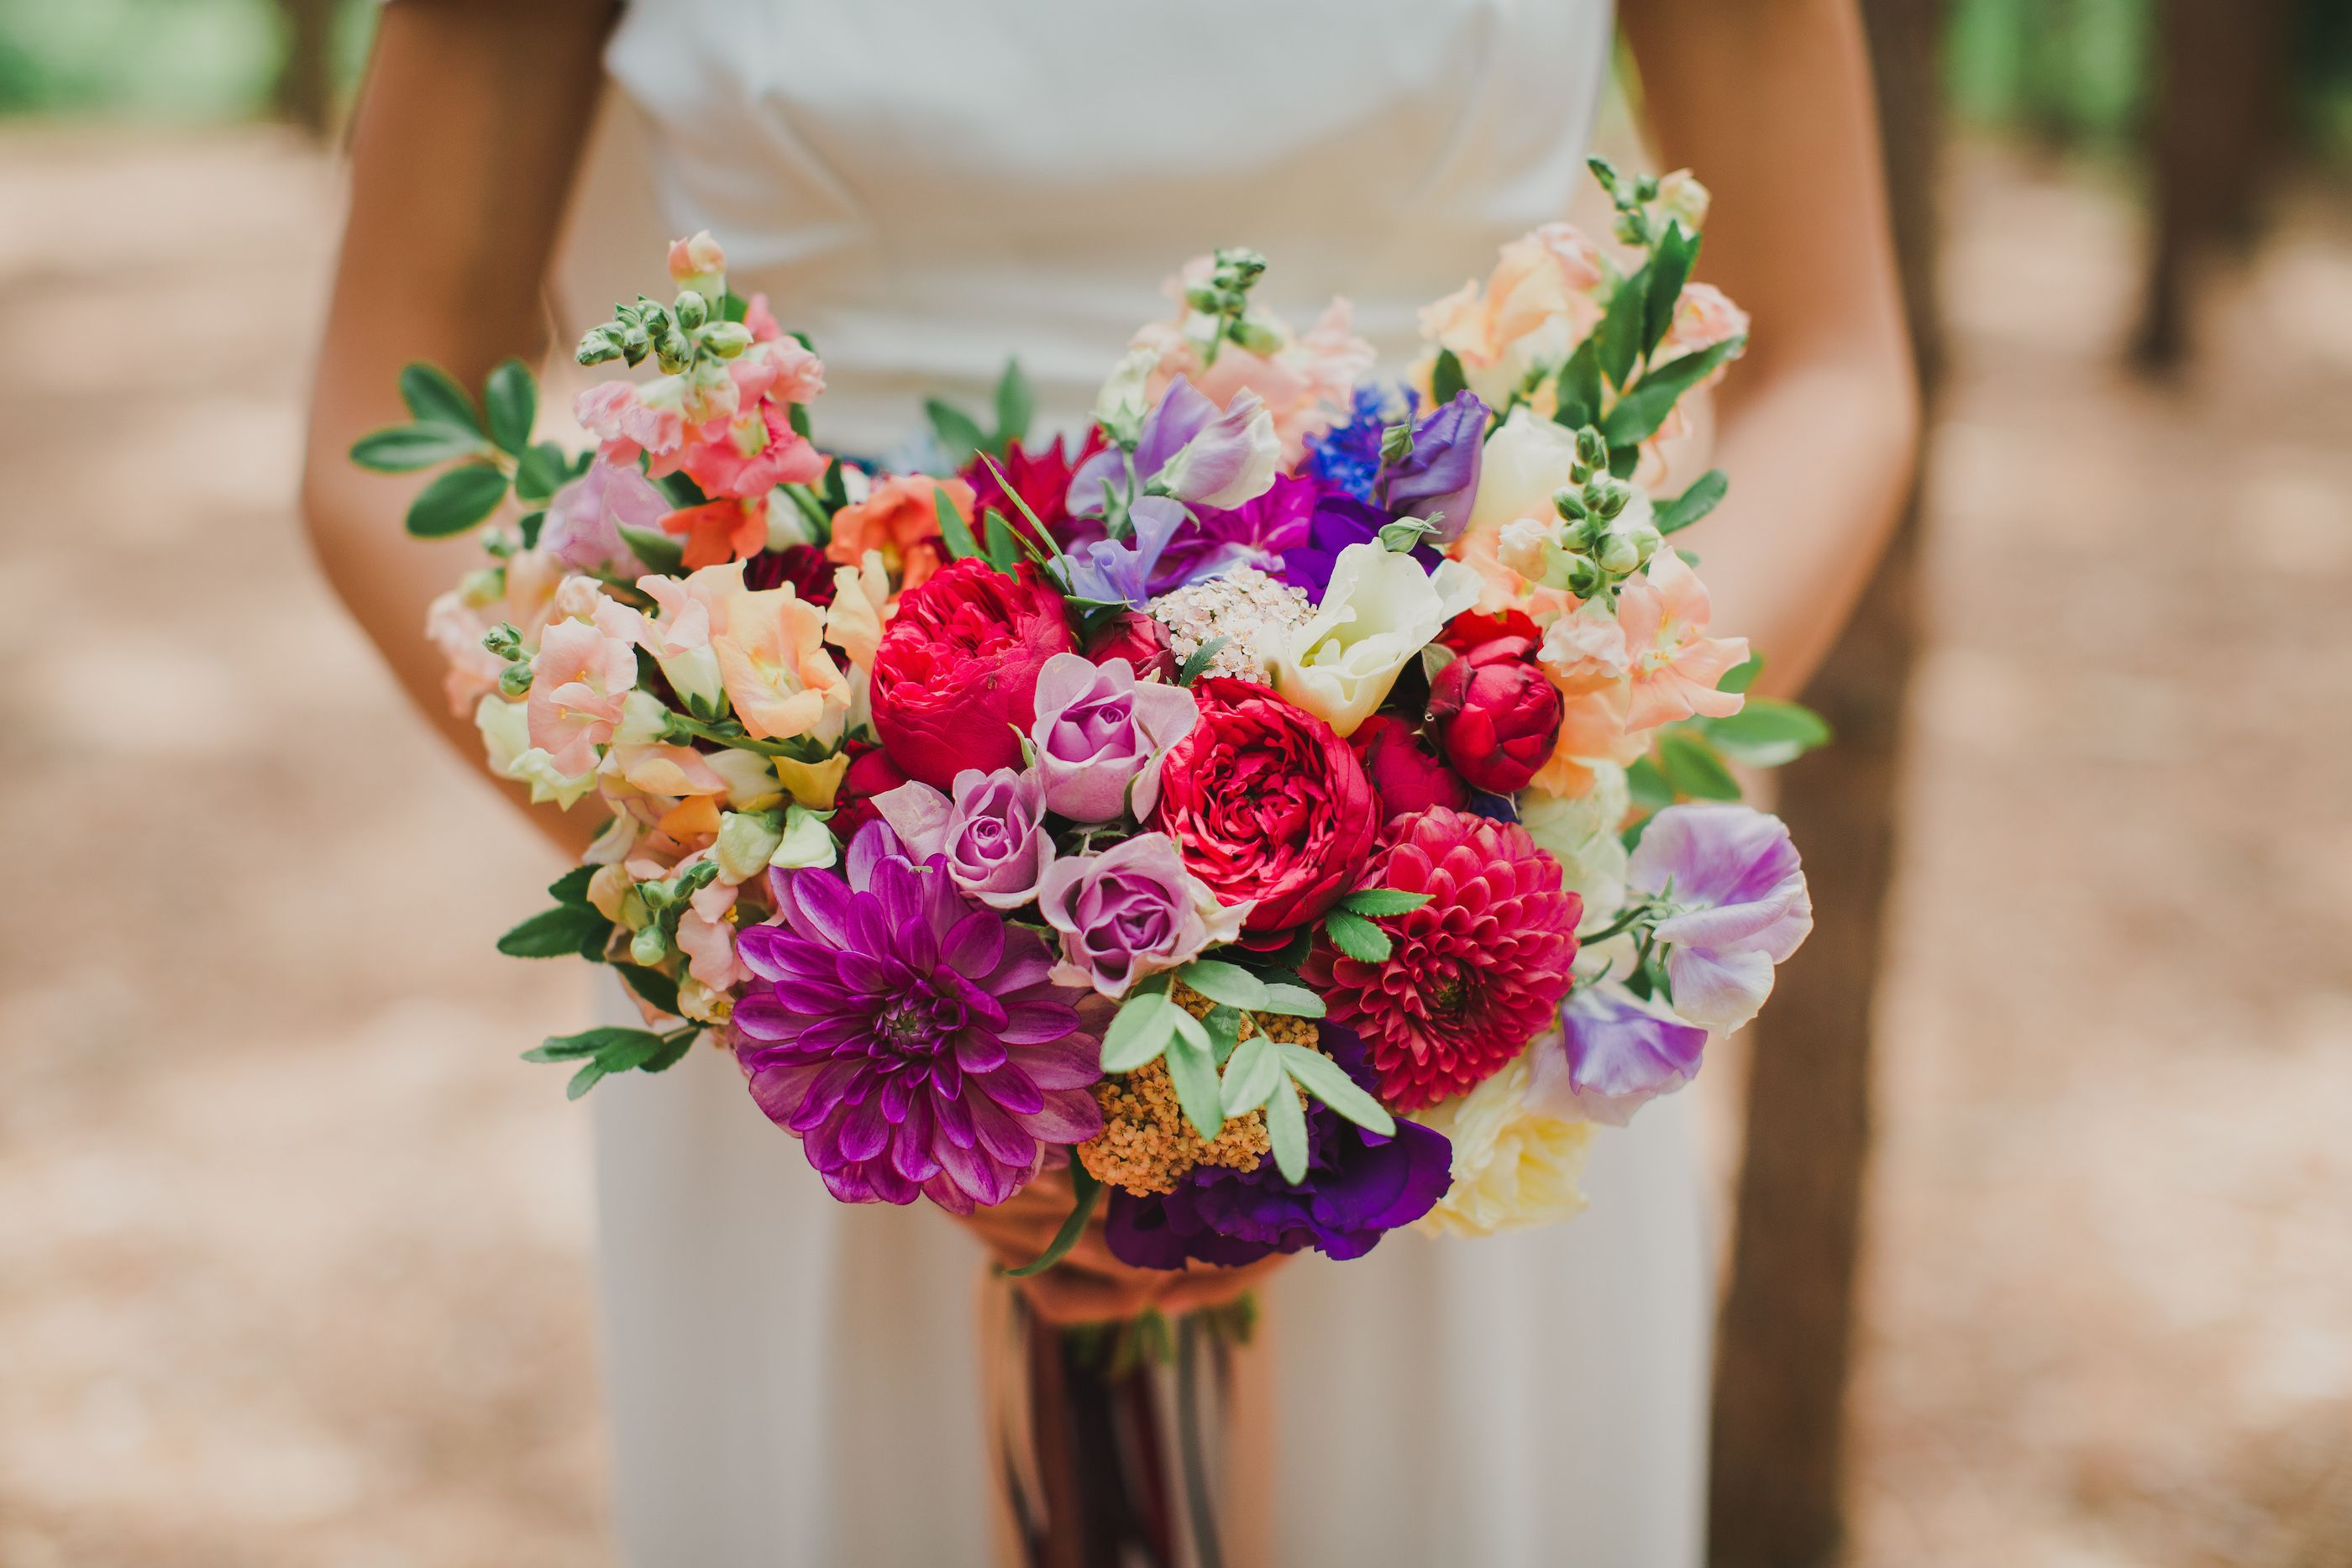 Toronto weddings and events wild north flowers flowers toronto weddings and events wild north flowers izmirmasajfo